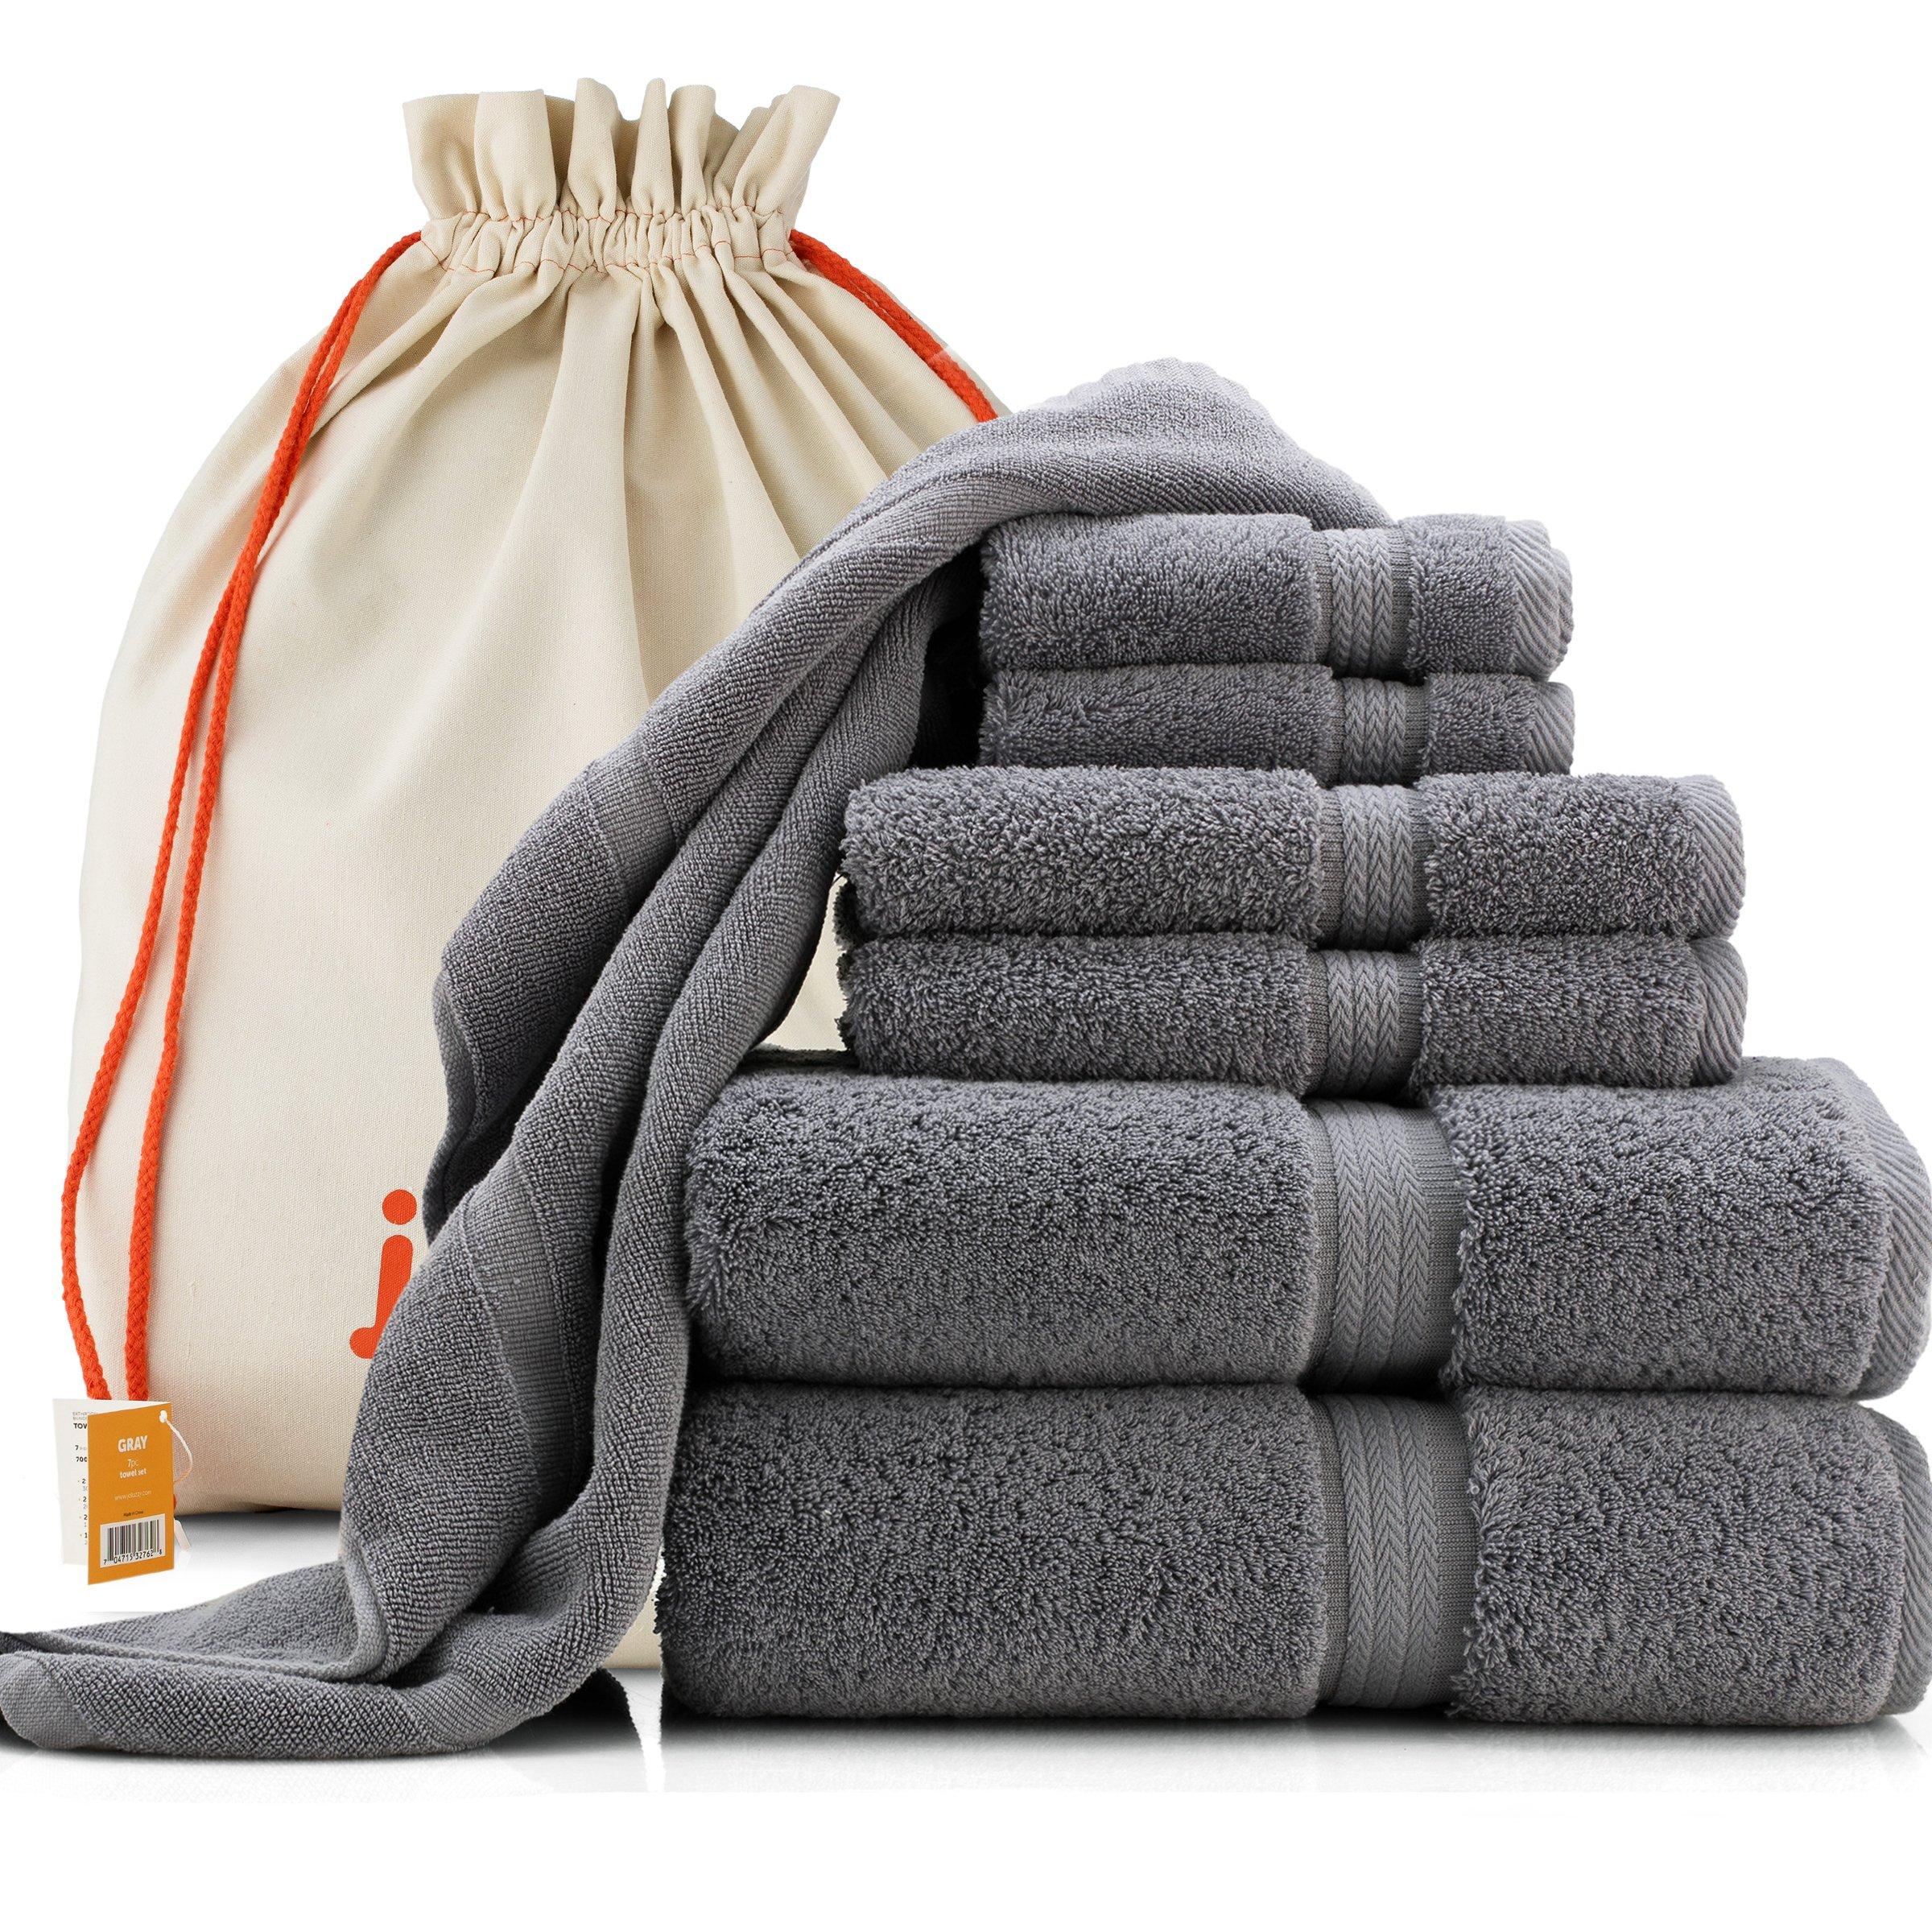 joluzzy Exlusive 7-Piece Towel Set, Steel-Blue/Gray - 100% Long-staple Cotton - High Density Absorbent 700 GSM - Soft & Plush - Hotel Quality - 2 Bath Towels, 2 Hand Towels, 2 Face Towels, 1 Floor Mat